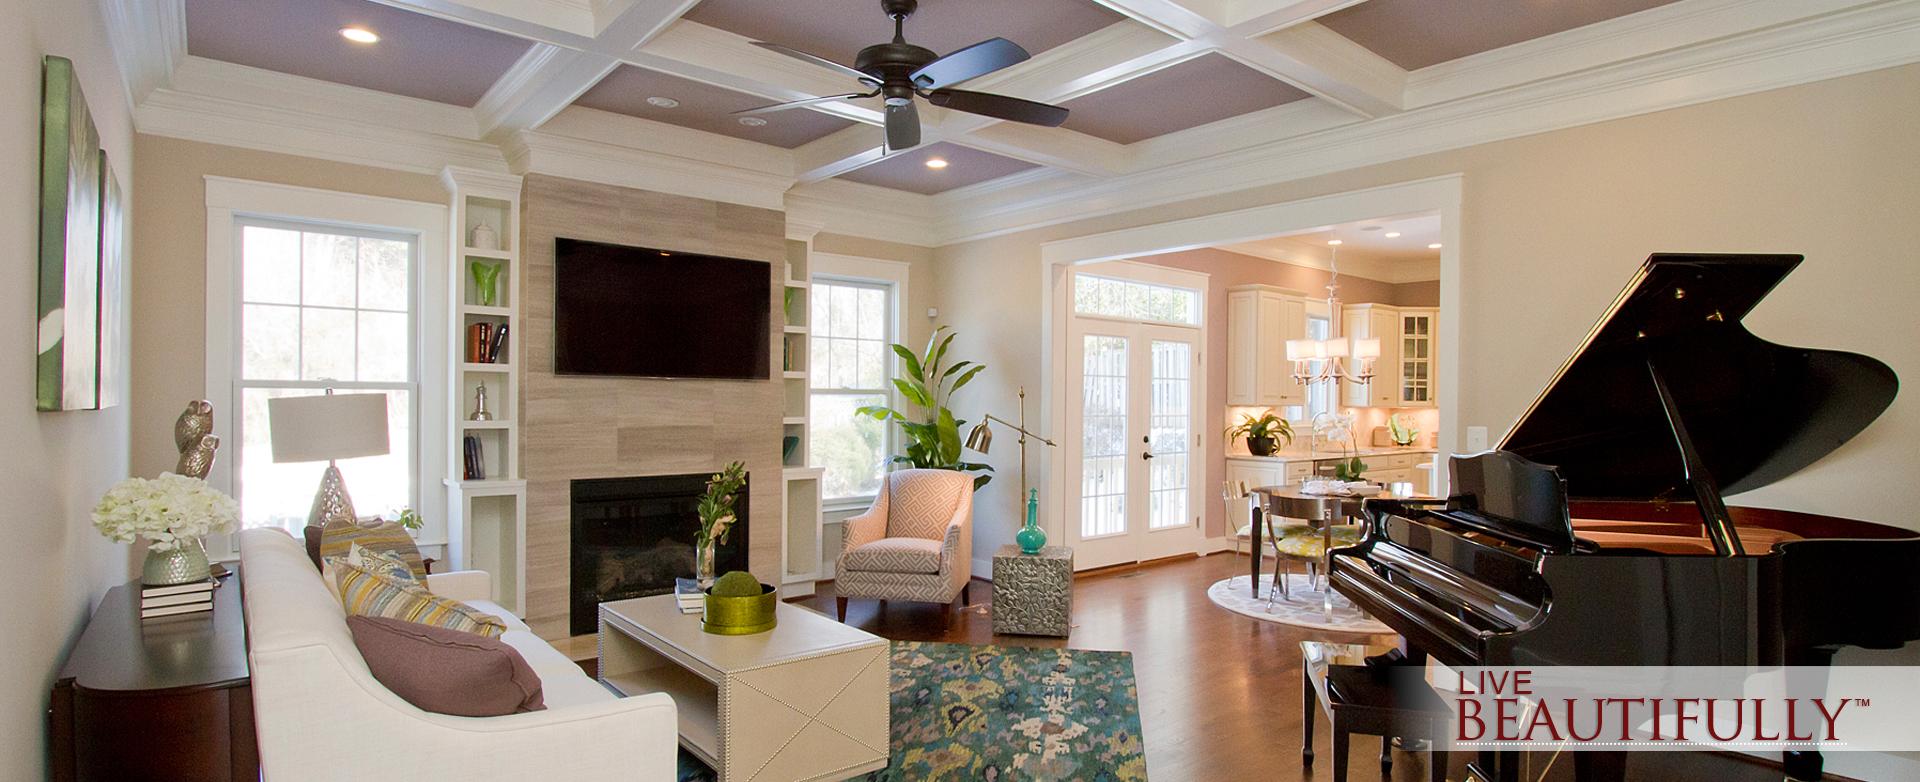 Livingroomheader1